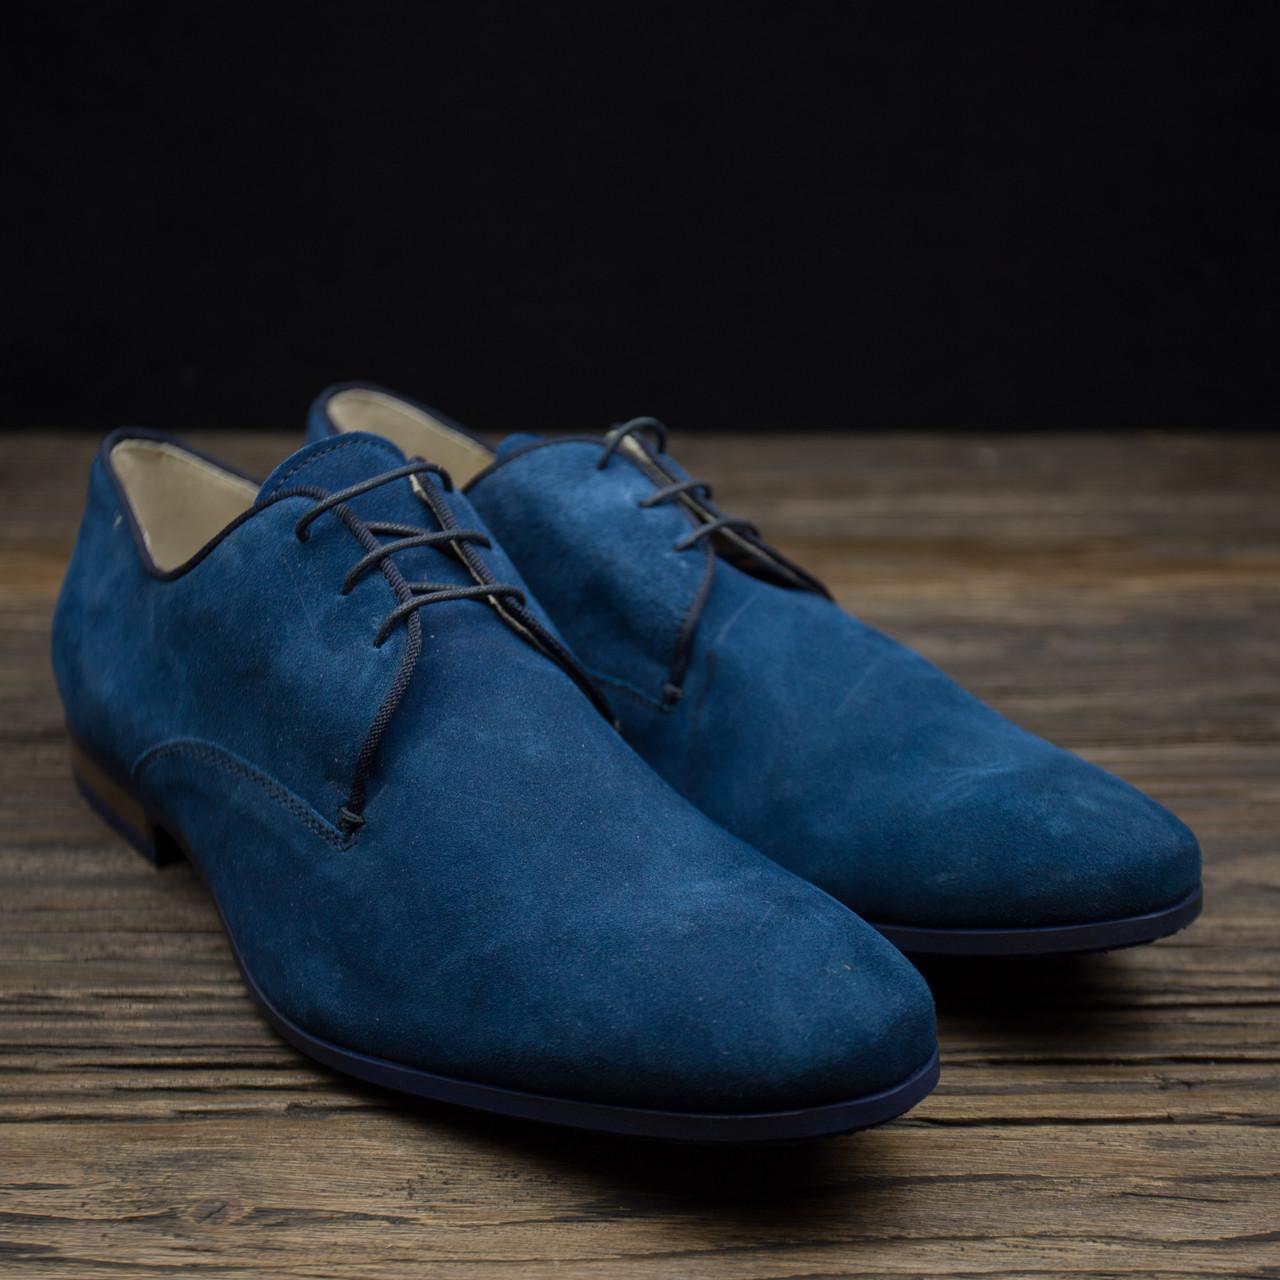 Мужские туфли натуральная замша San Marina р-44